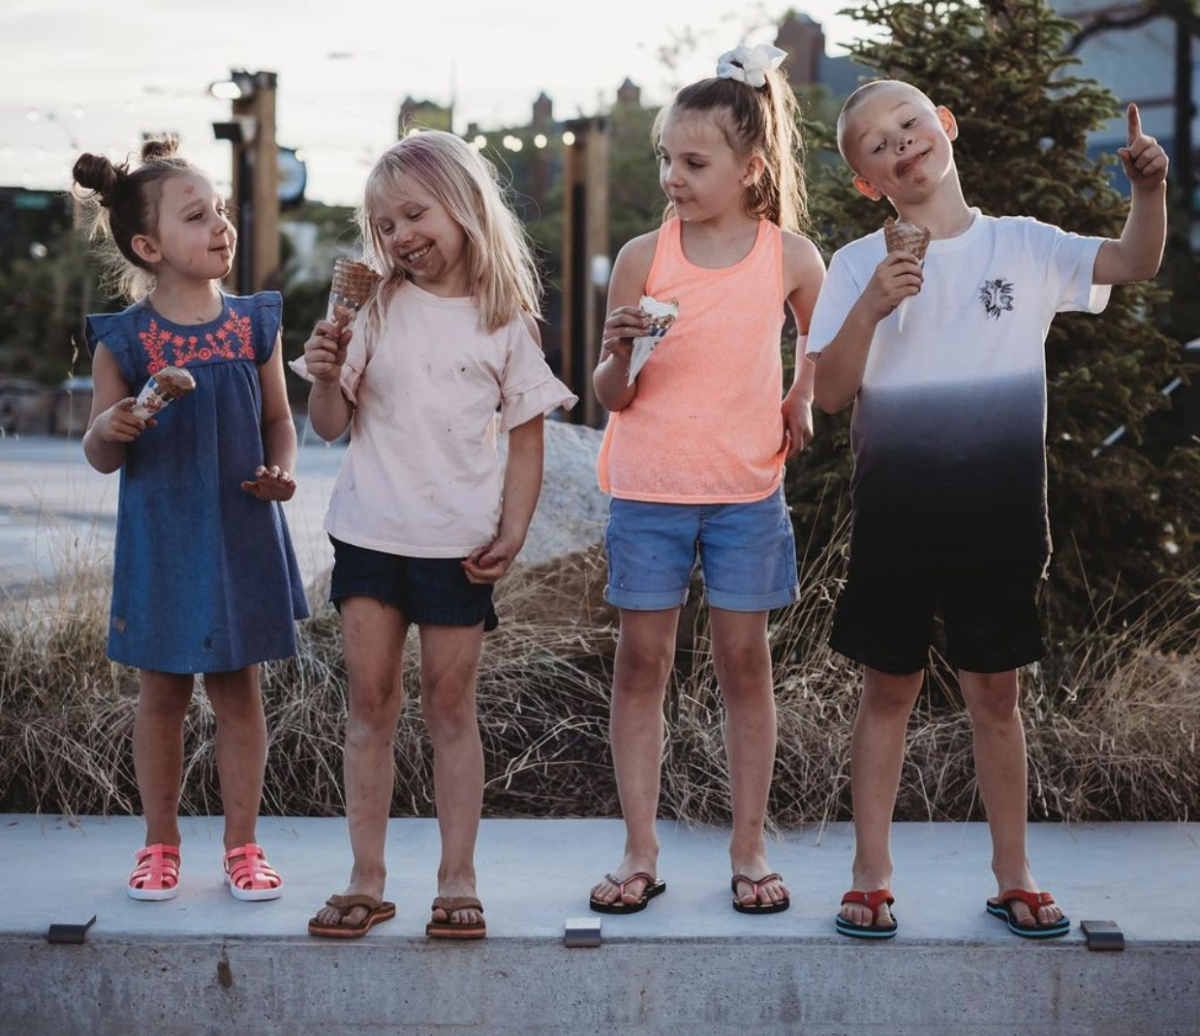 Children in Downtown Casper, Wyoming